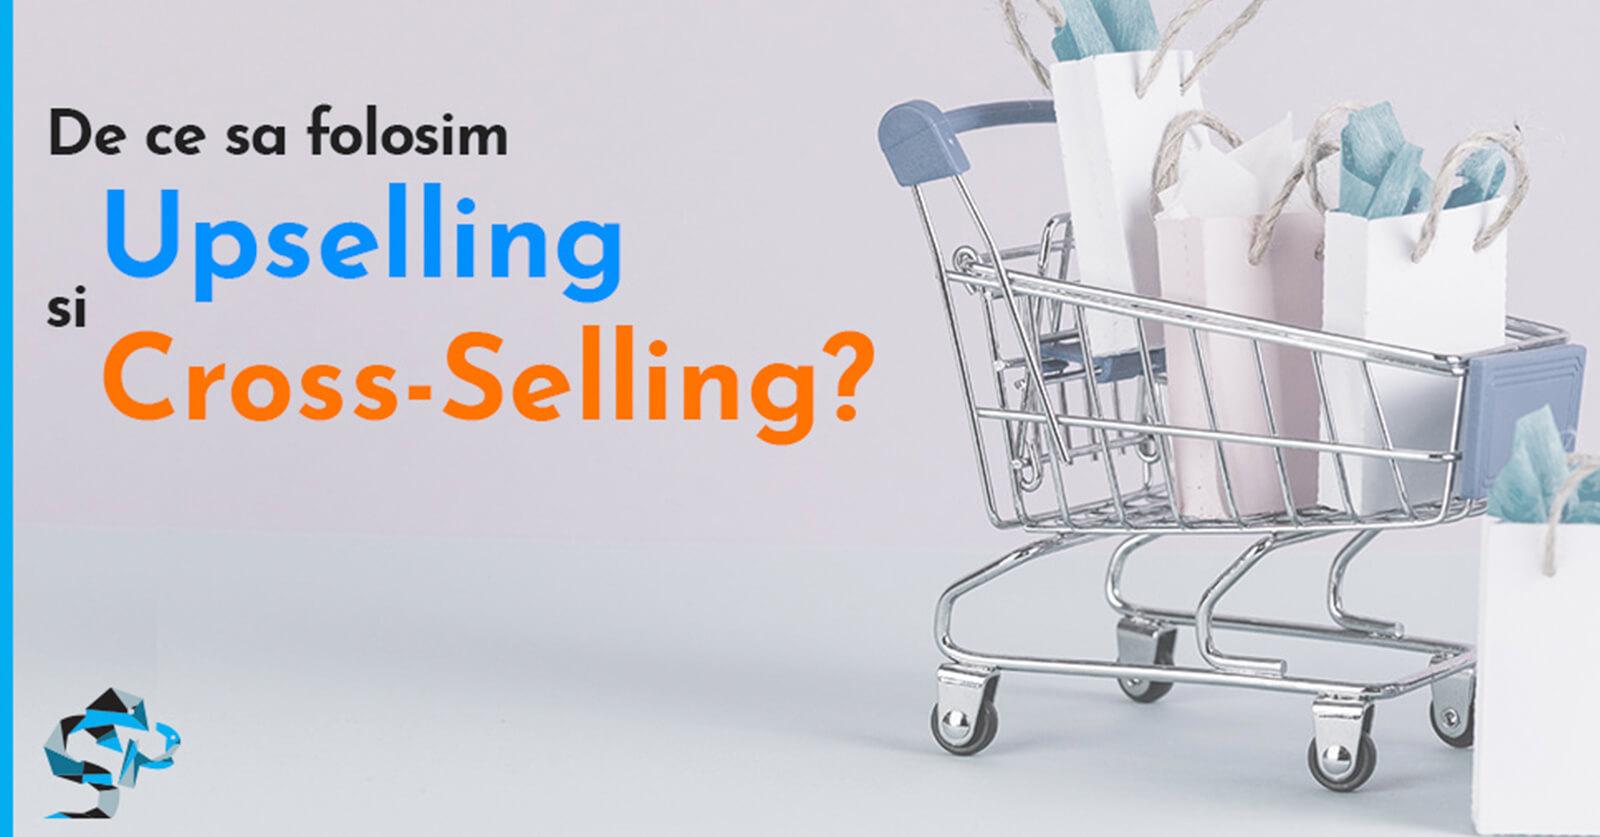 upselling-cross-selling-marketing